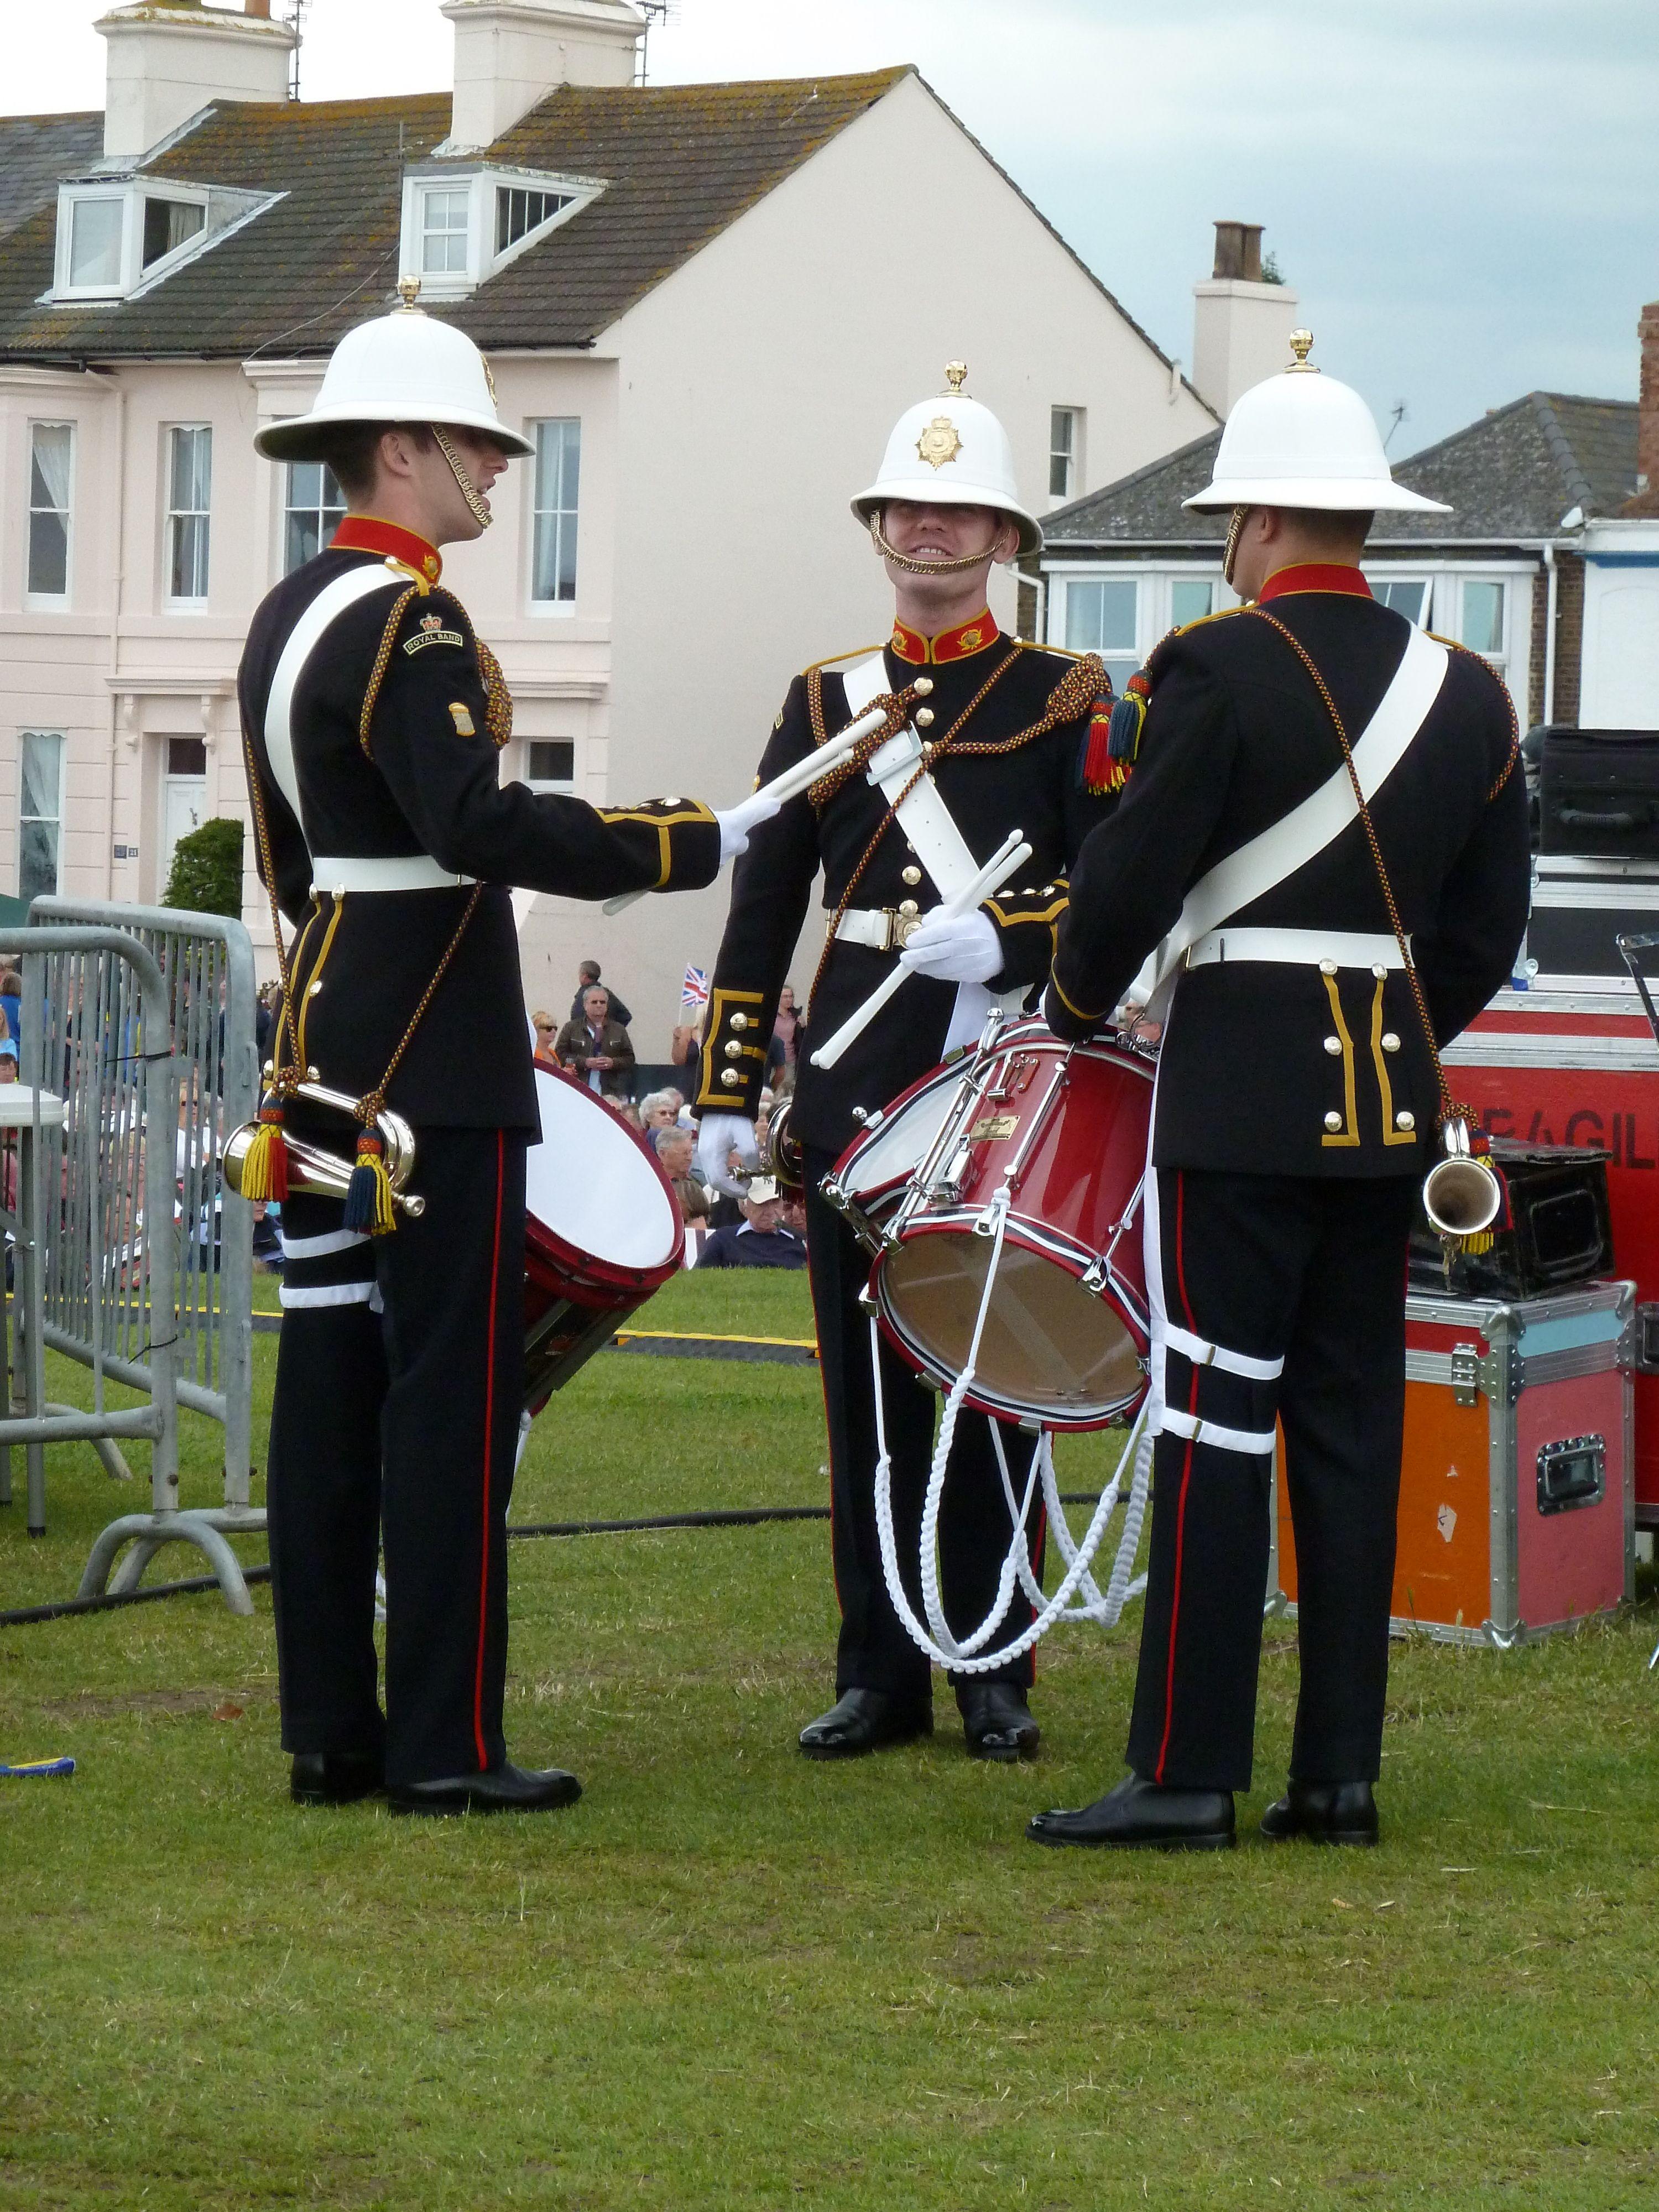 Royal Marines In 2020 Royal Marines Band Royal Marines Royal Marine Commando